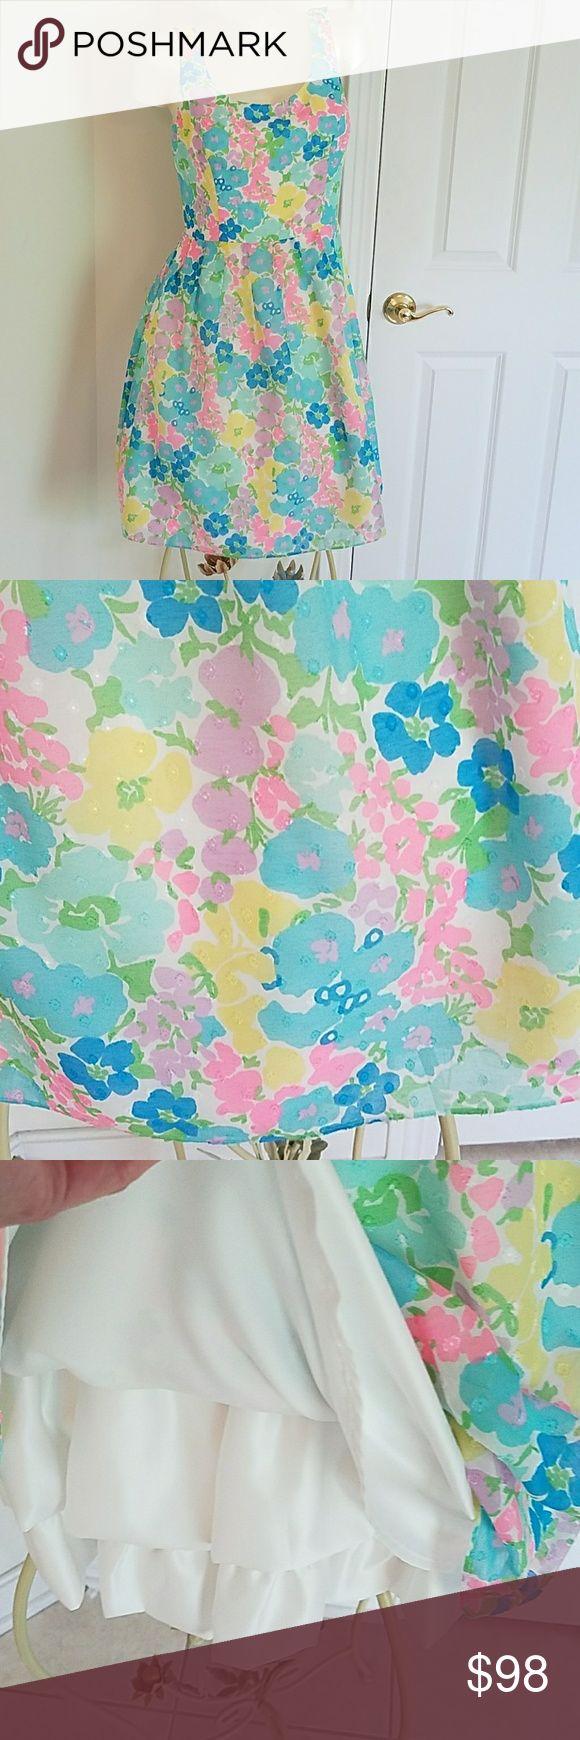 "SALE  Lilly Pulitzer Dress sz 6 floral print Lilly Pulitzer Dress sz 6. 37""long, armpit to armpit 17.5"", waist 29"",hip 45"", sweep 55"". Floral print. Lilly Pulitzer Dresses"